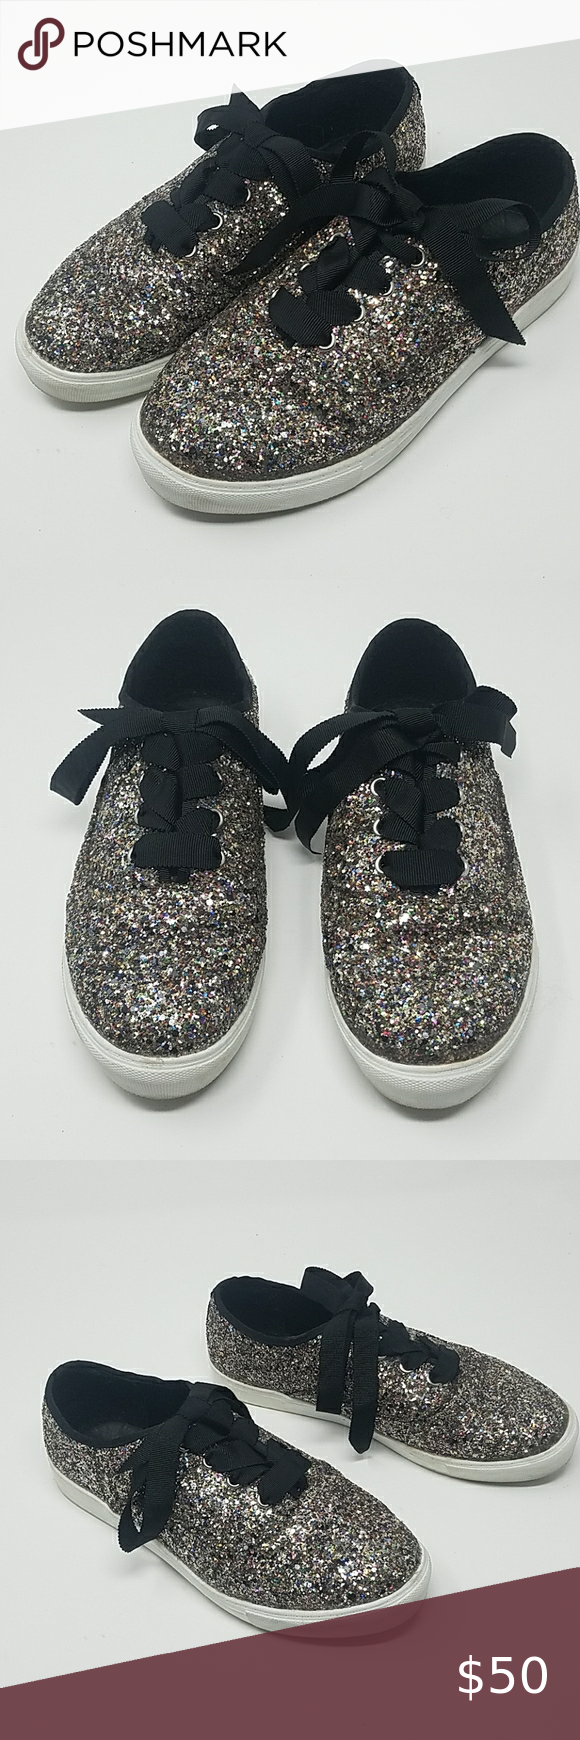 TORRID All Over Glitter Sneakers size 8